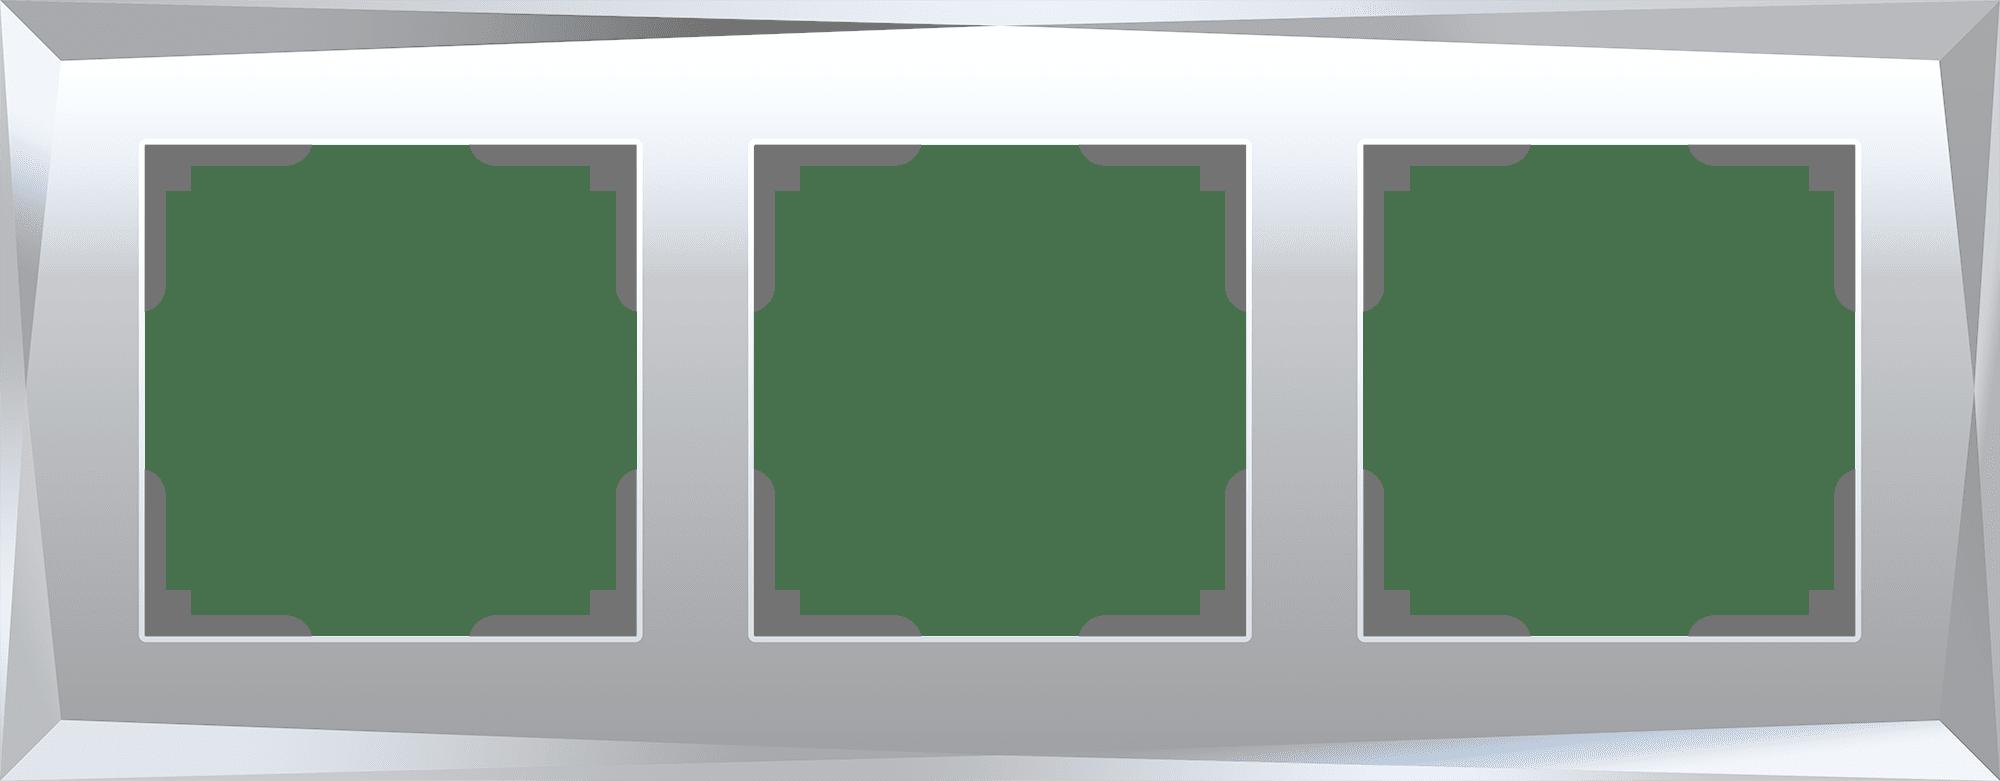 Рамка на 3 поста (зеркальный) W0031220